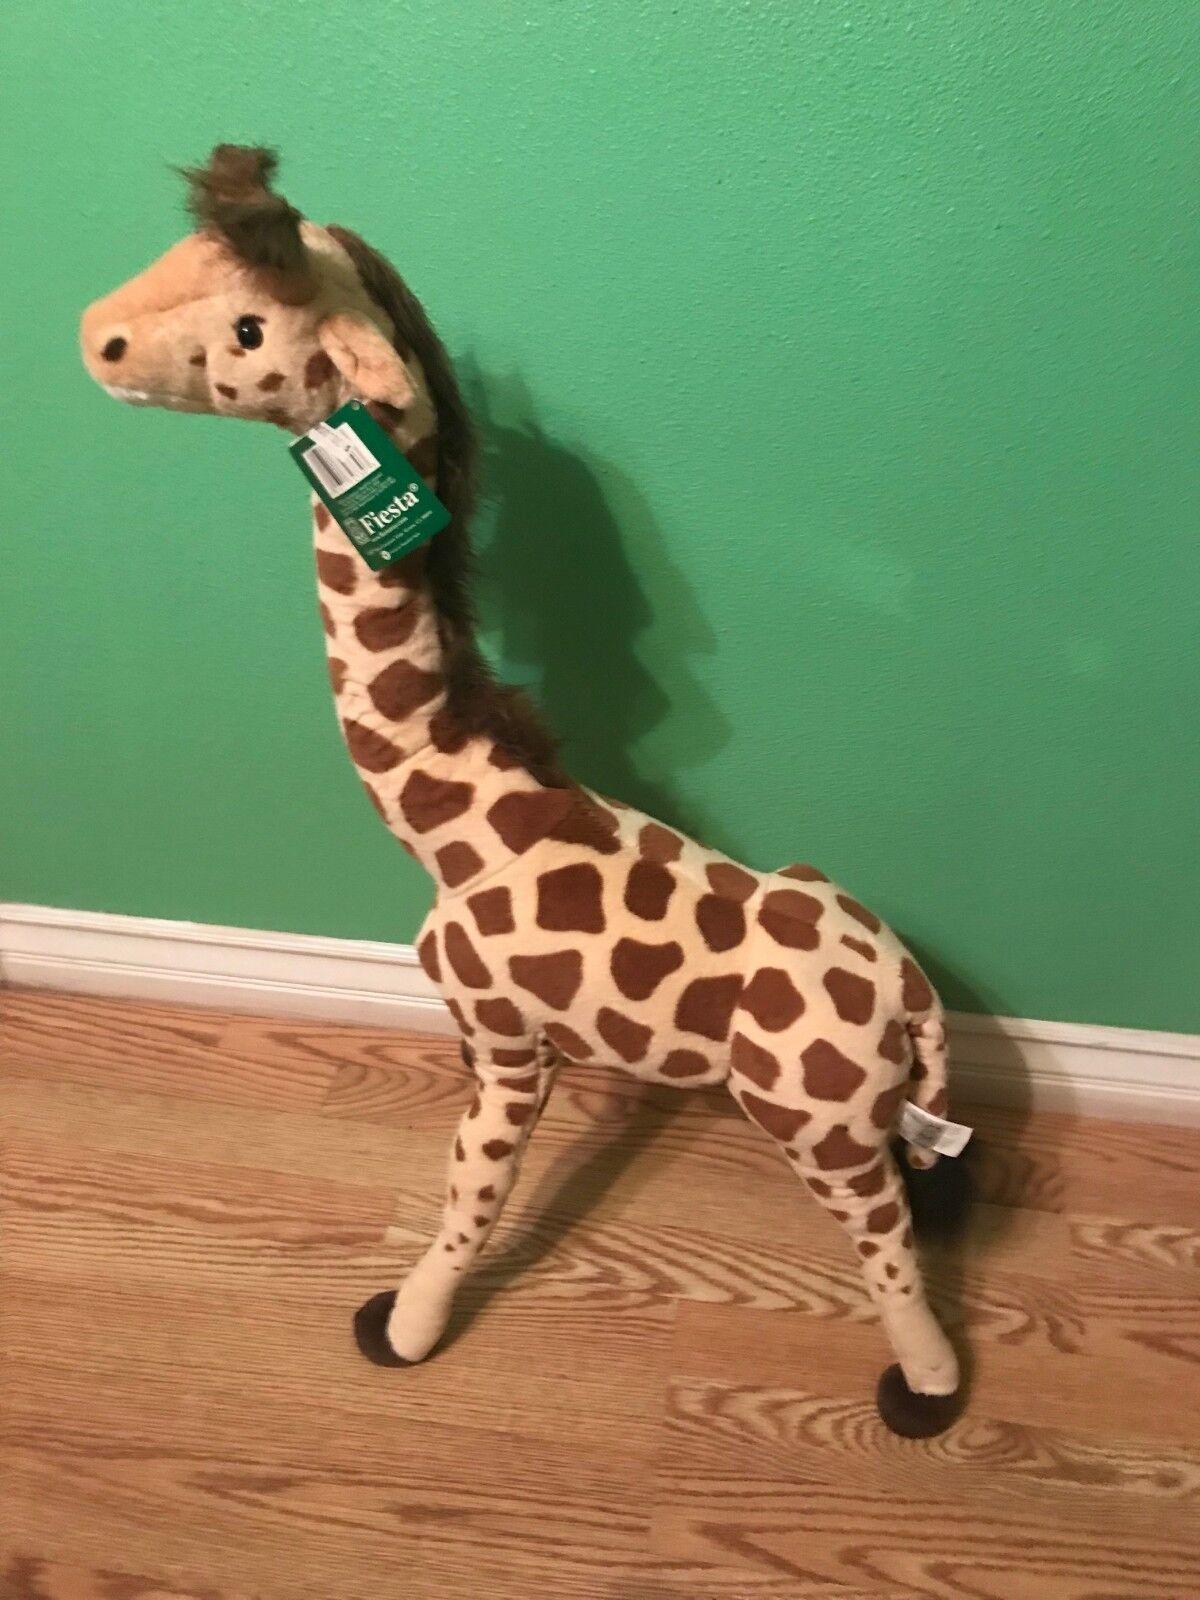 Fiesta Toys Giraffe Standing Plush Stuffed Animal Toy by Plush, 34  Large